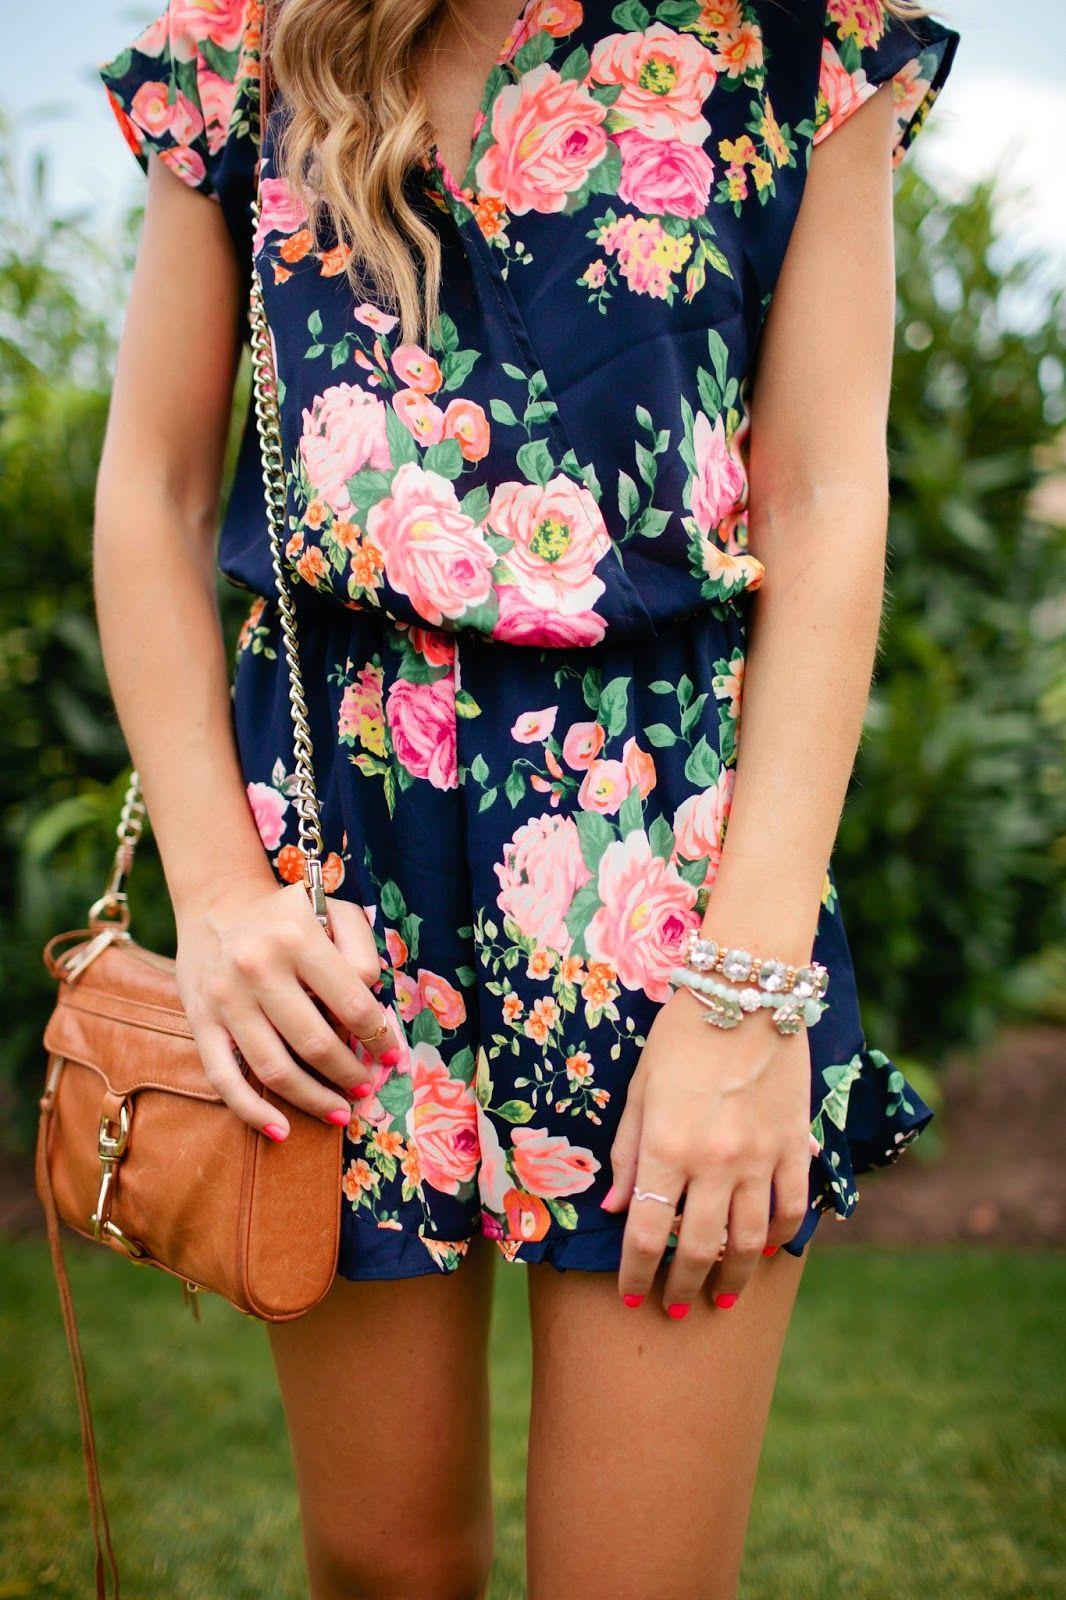 Summer romp fashion pinterest style fashion and girl fashion